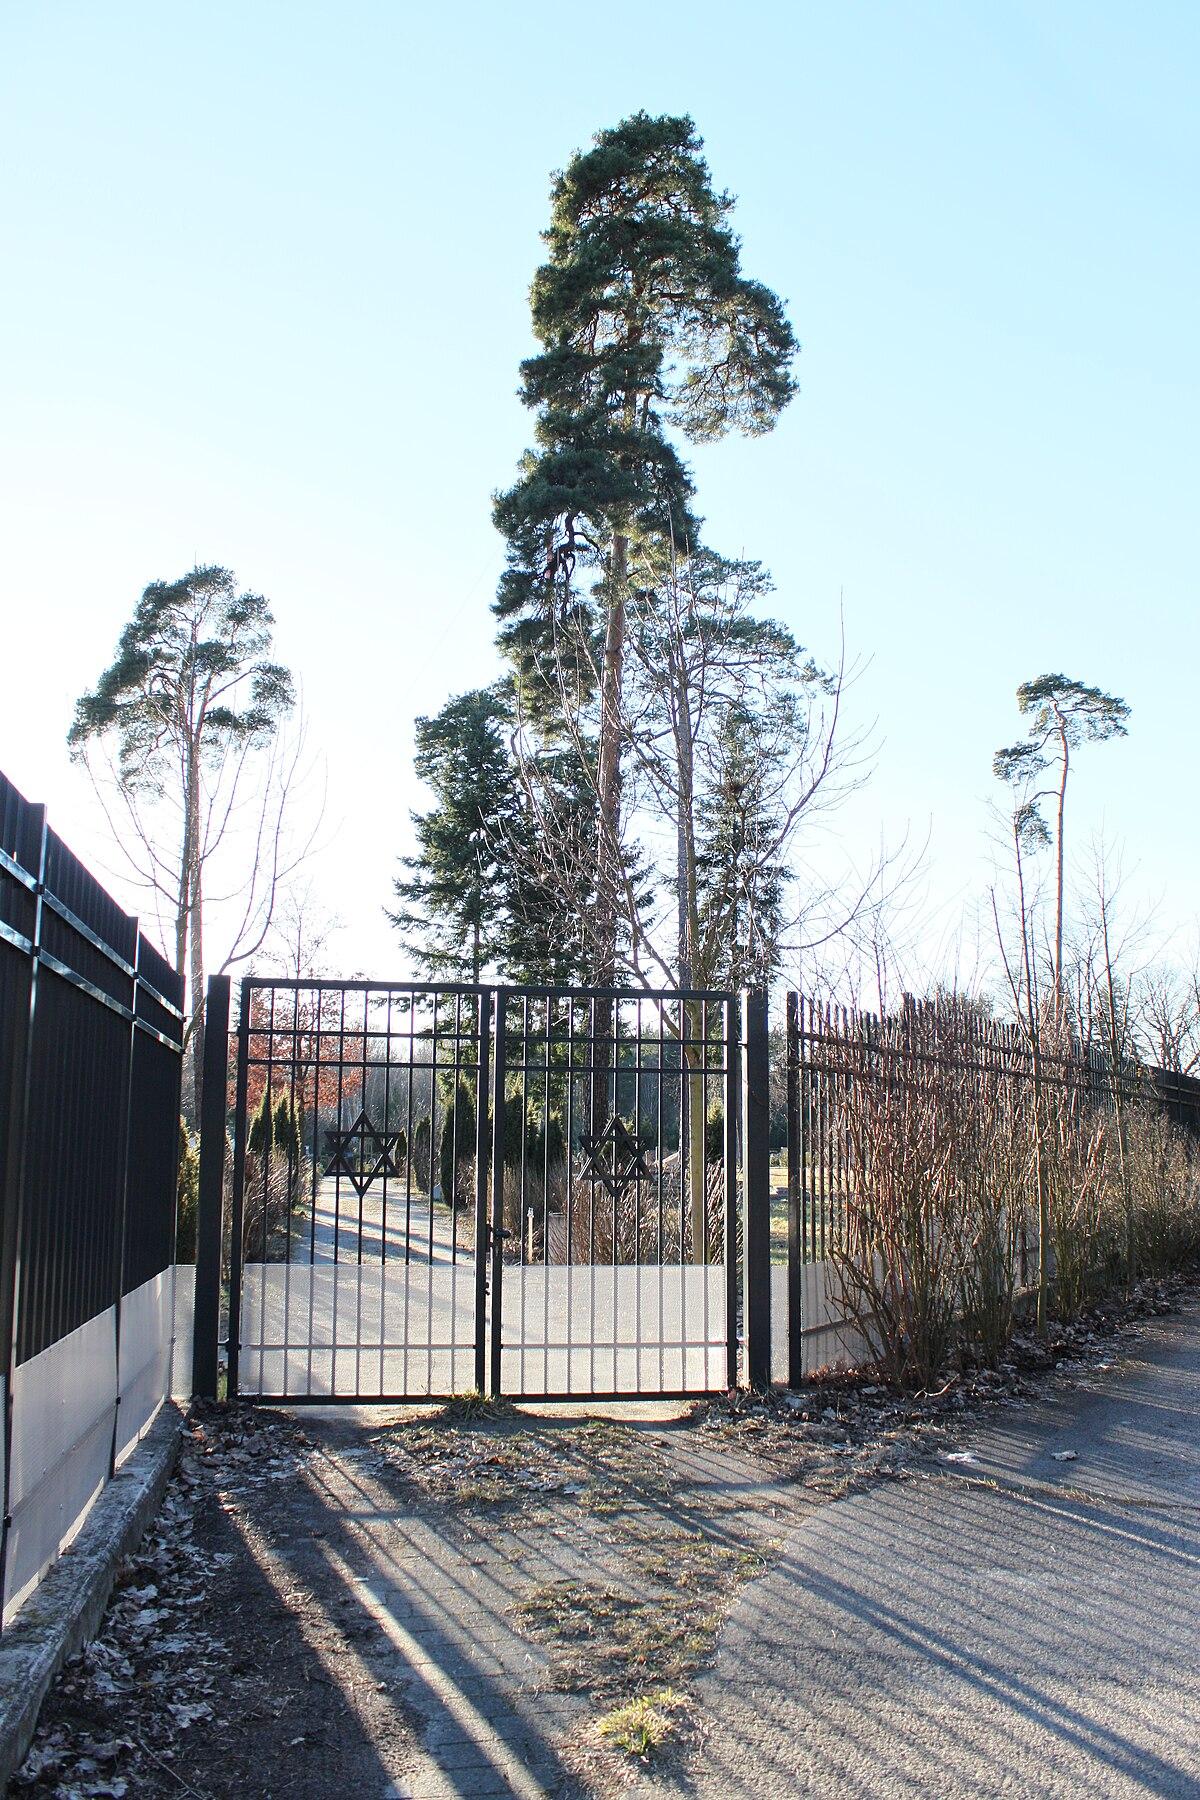 File:Berlin Jüdischer Friedhof Heerstraße 54.JPG